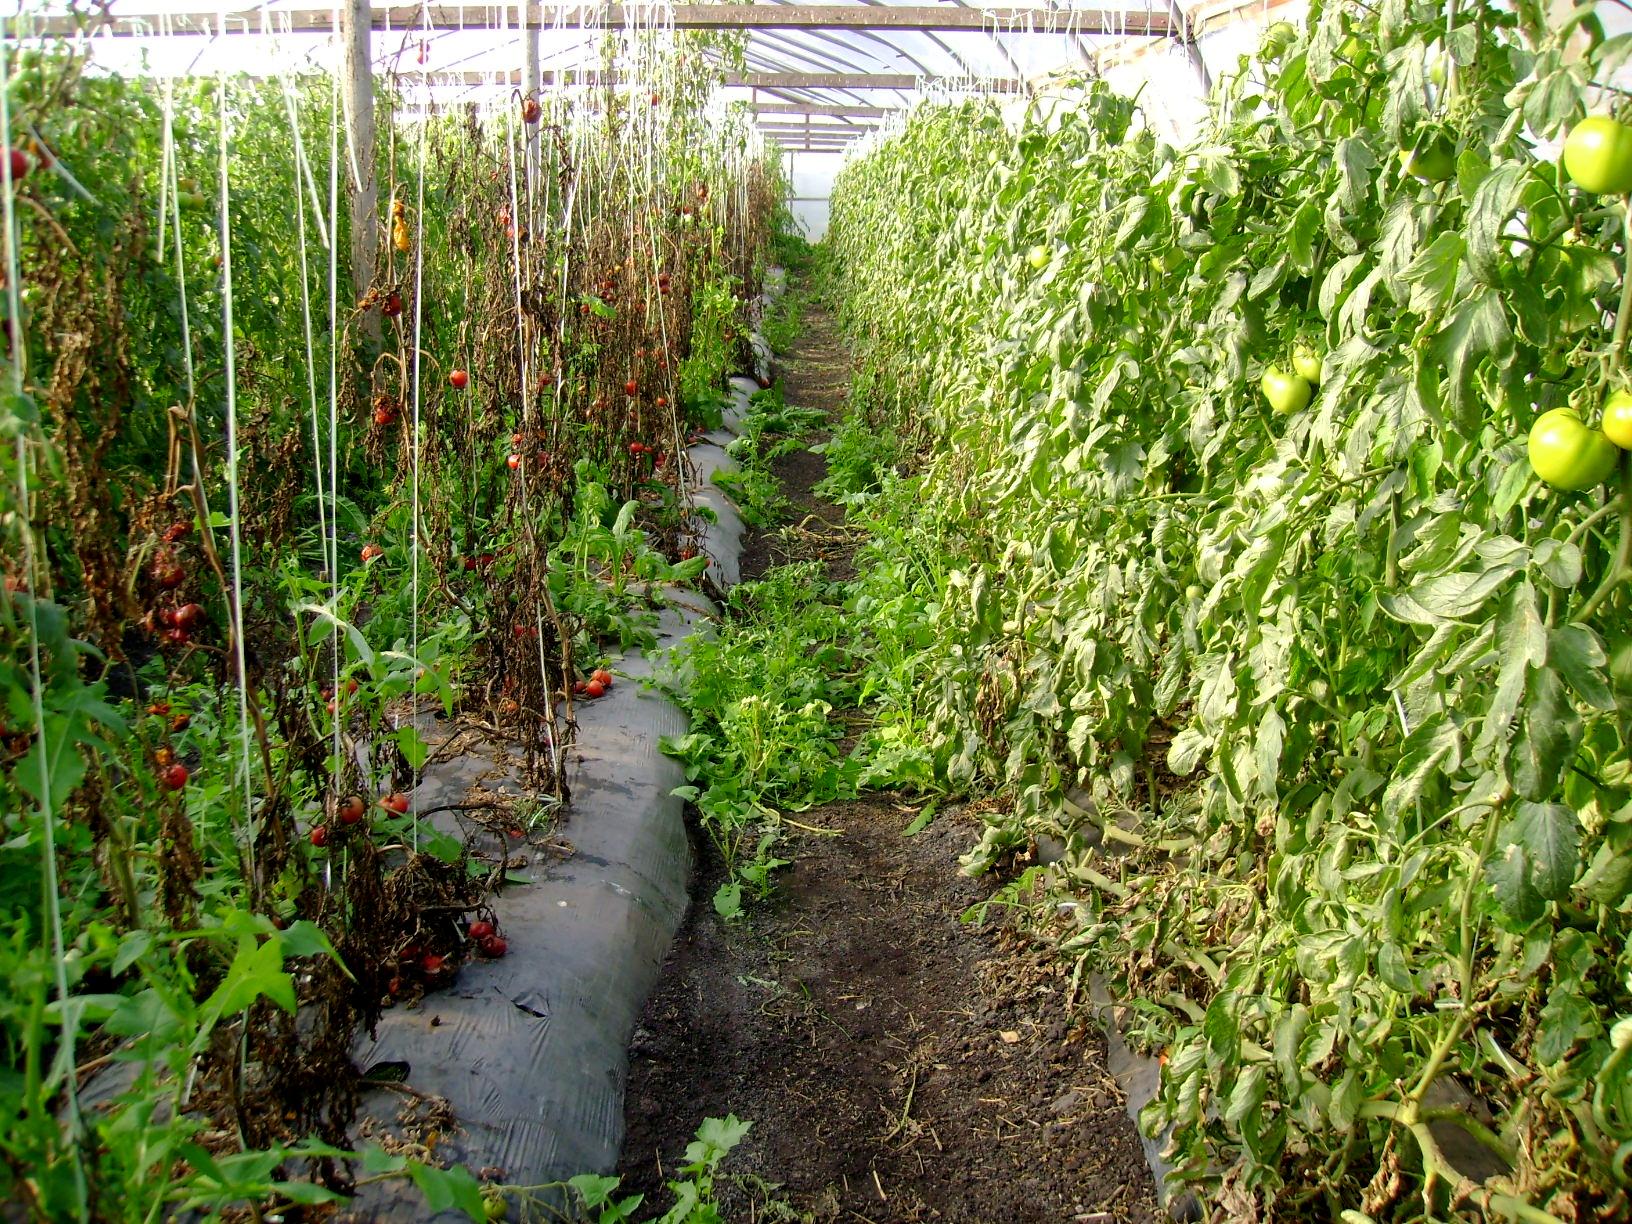 Avances con injertos en horticultura